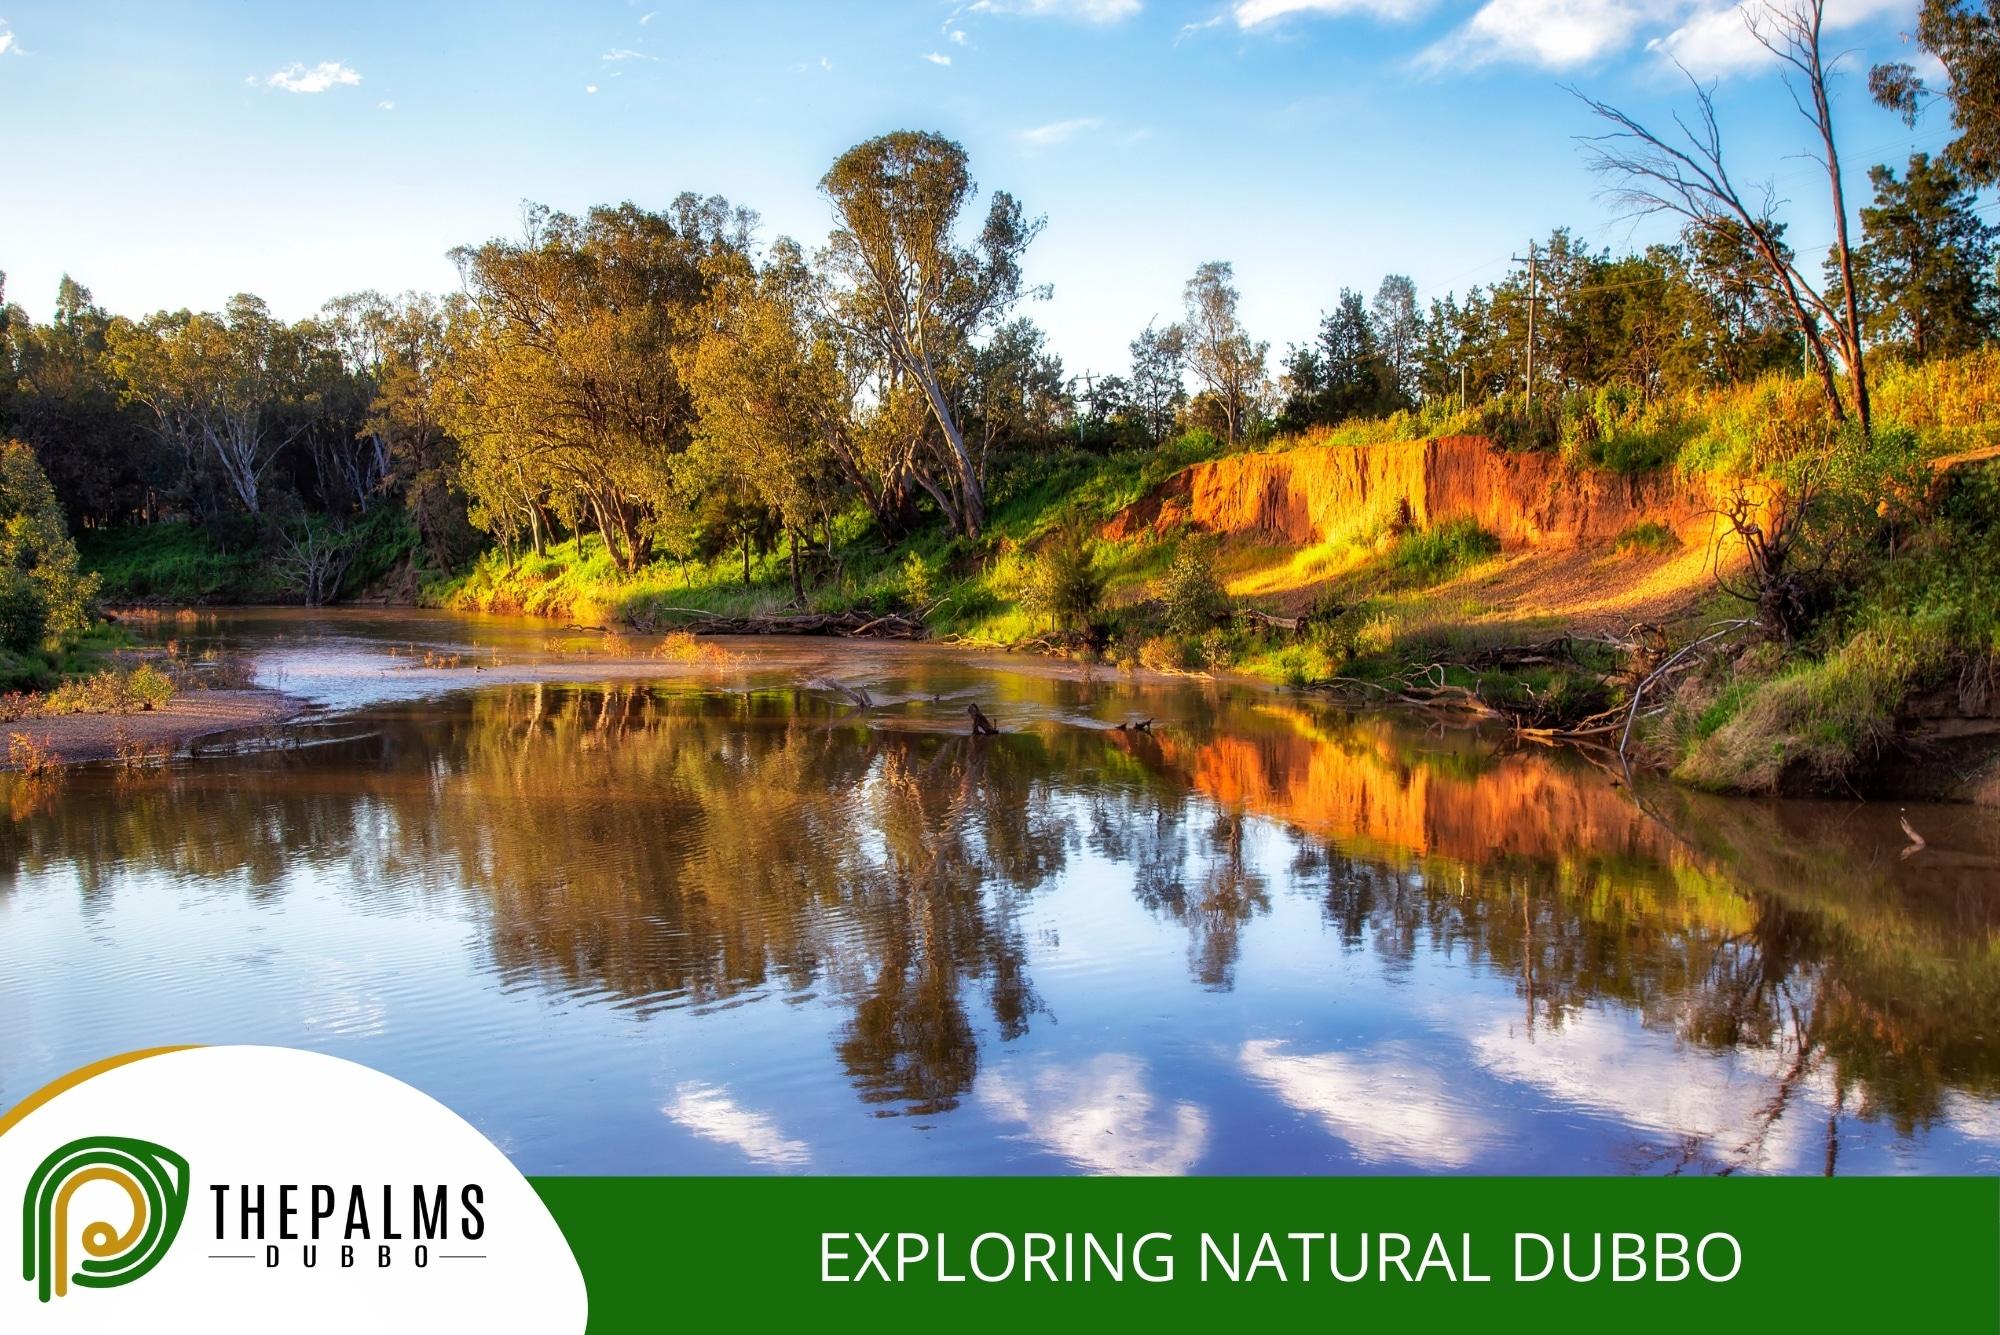 Exploring Natural Dubbo